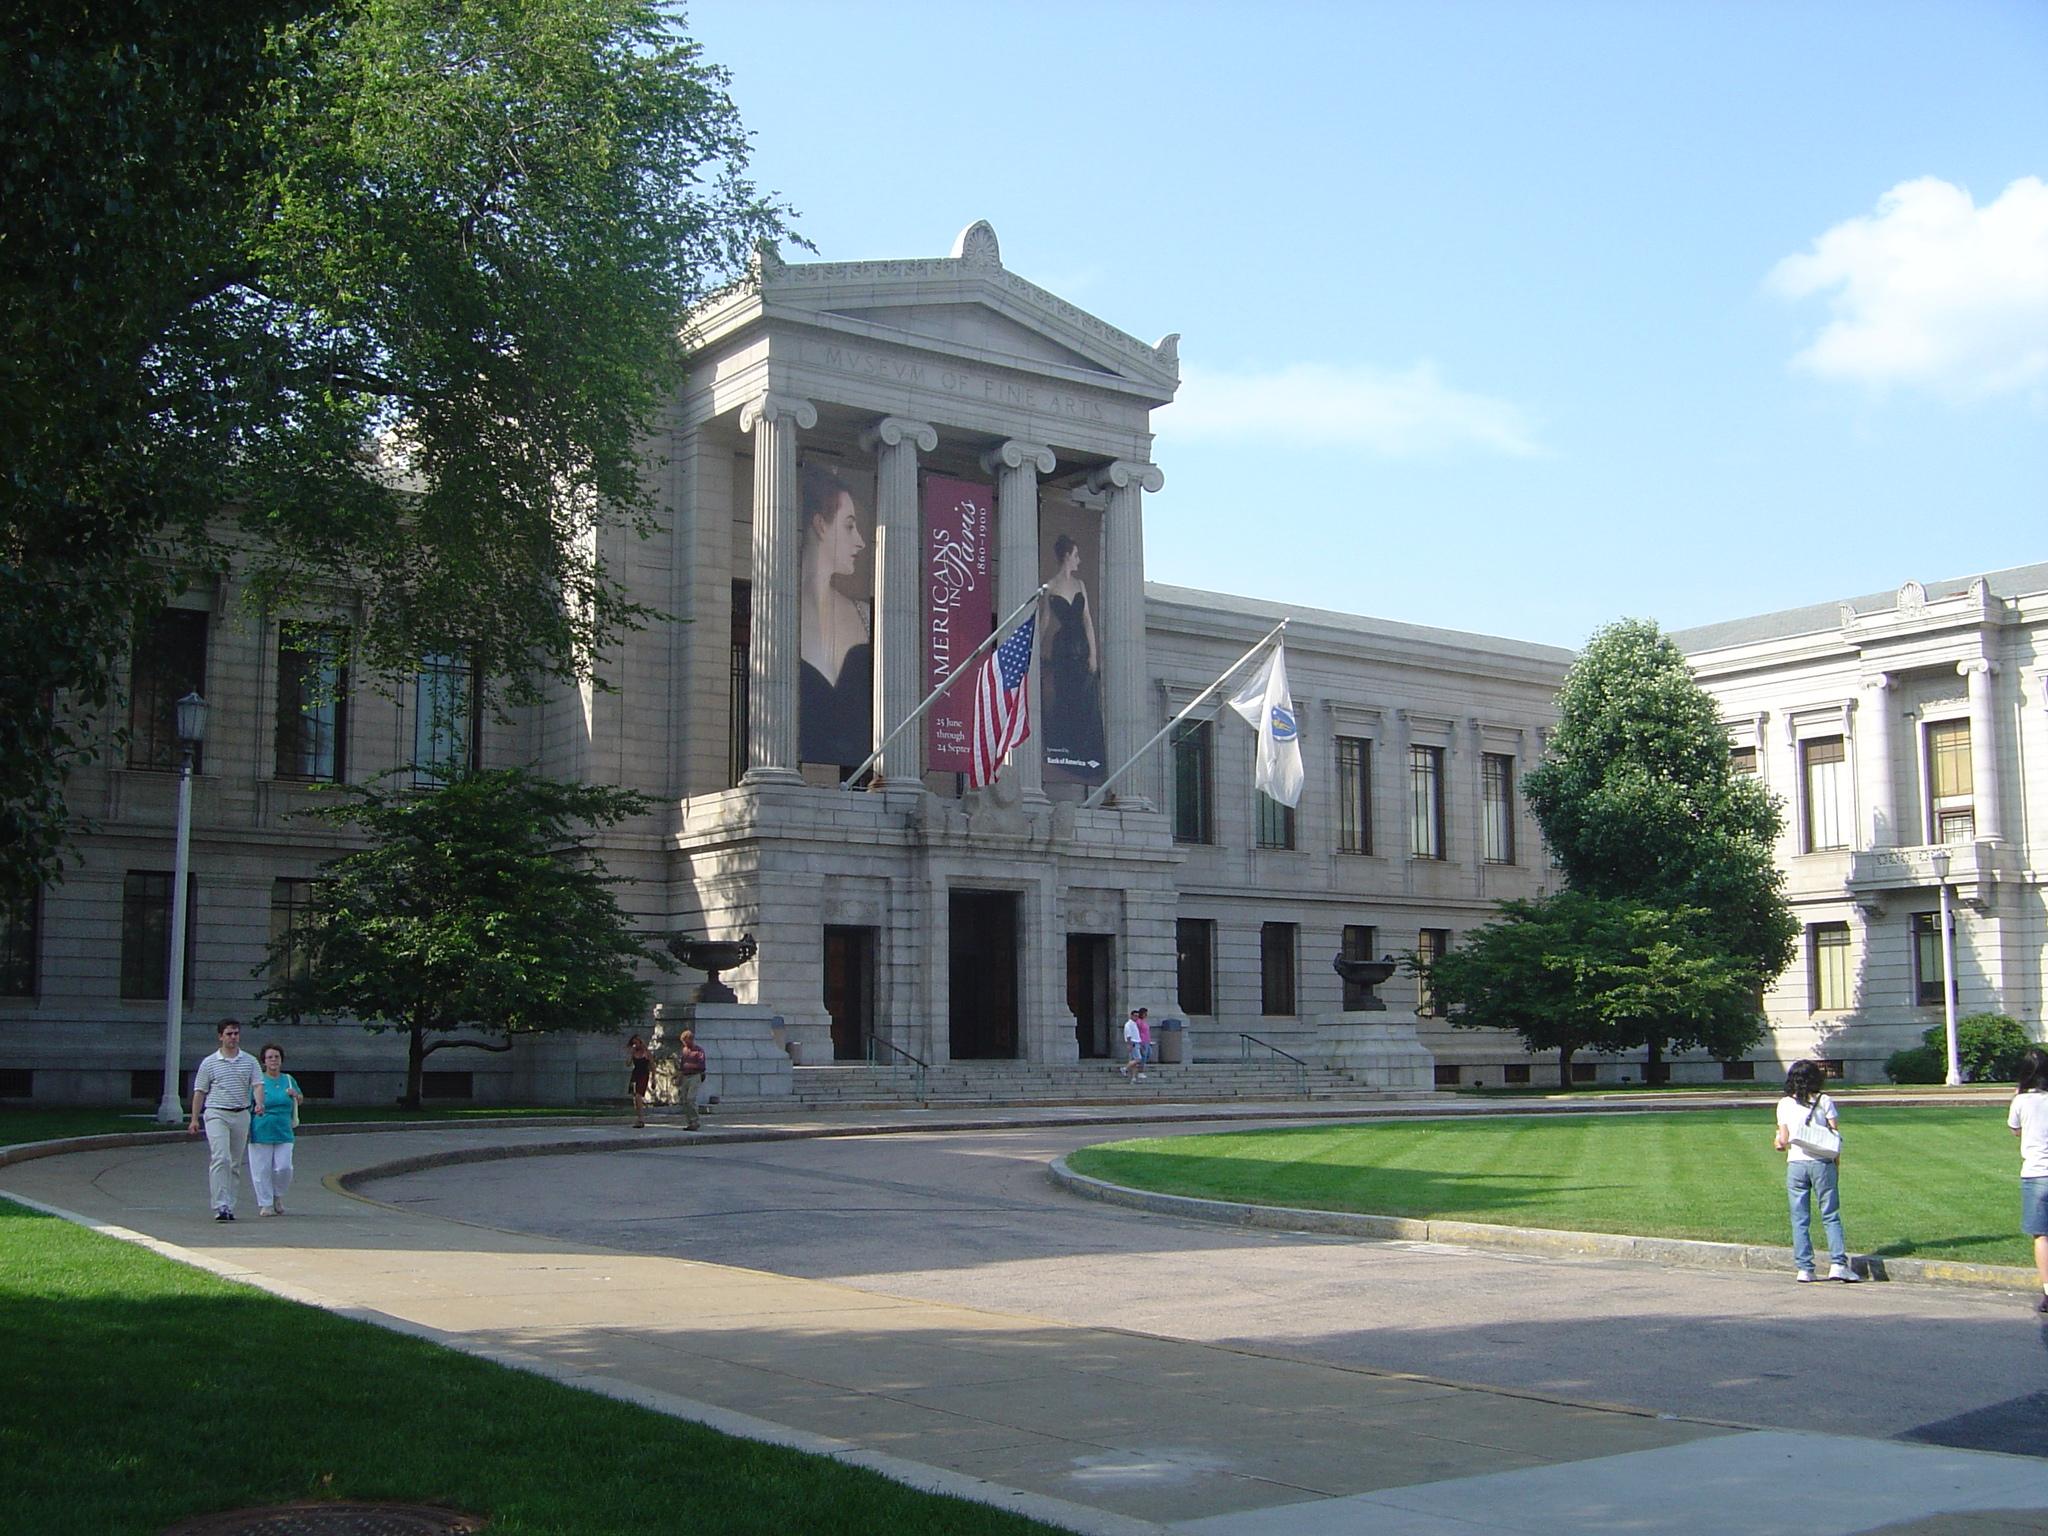 Museum of Fine Arts Boston, juli 2006. Foto met dank aan MamaGeek, CC BY-SA 3.0